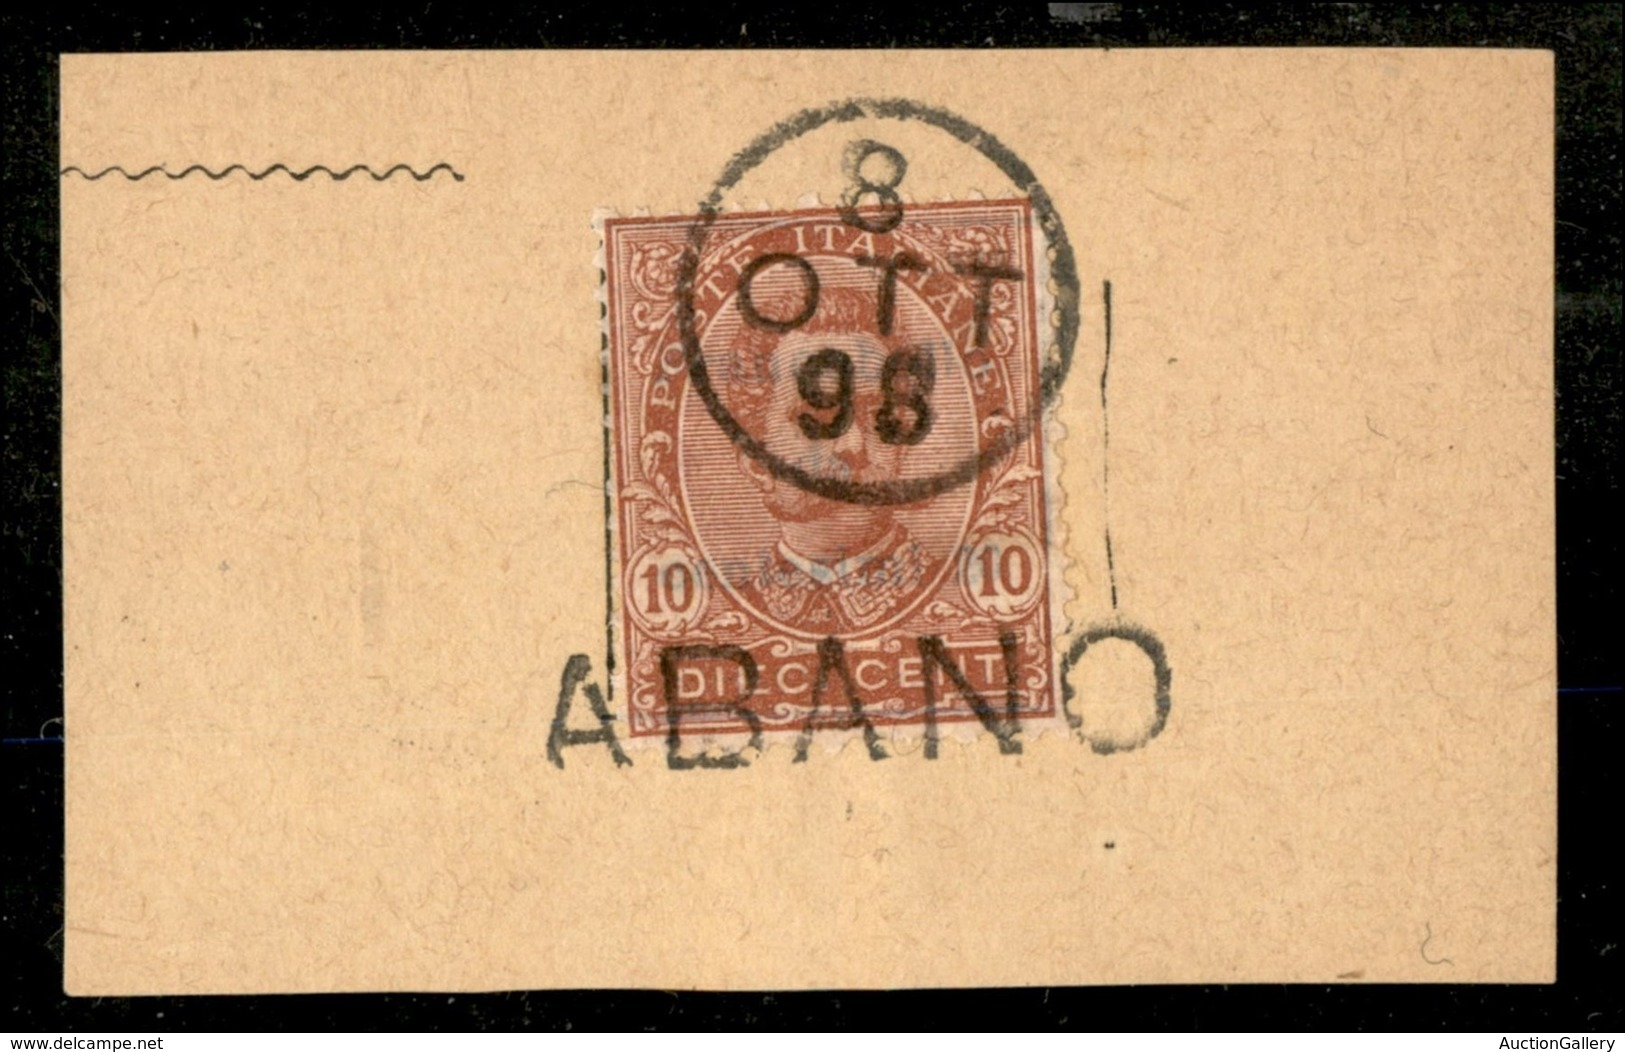 20745 REGNO D'ITALIA - UMBERTO I - Abano + Muto A Data (8.10.98) – 10 Cent Umberto (60) Su Frammento - Ohne Zuordnung